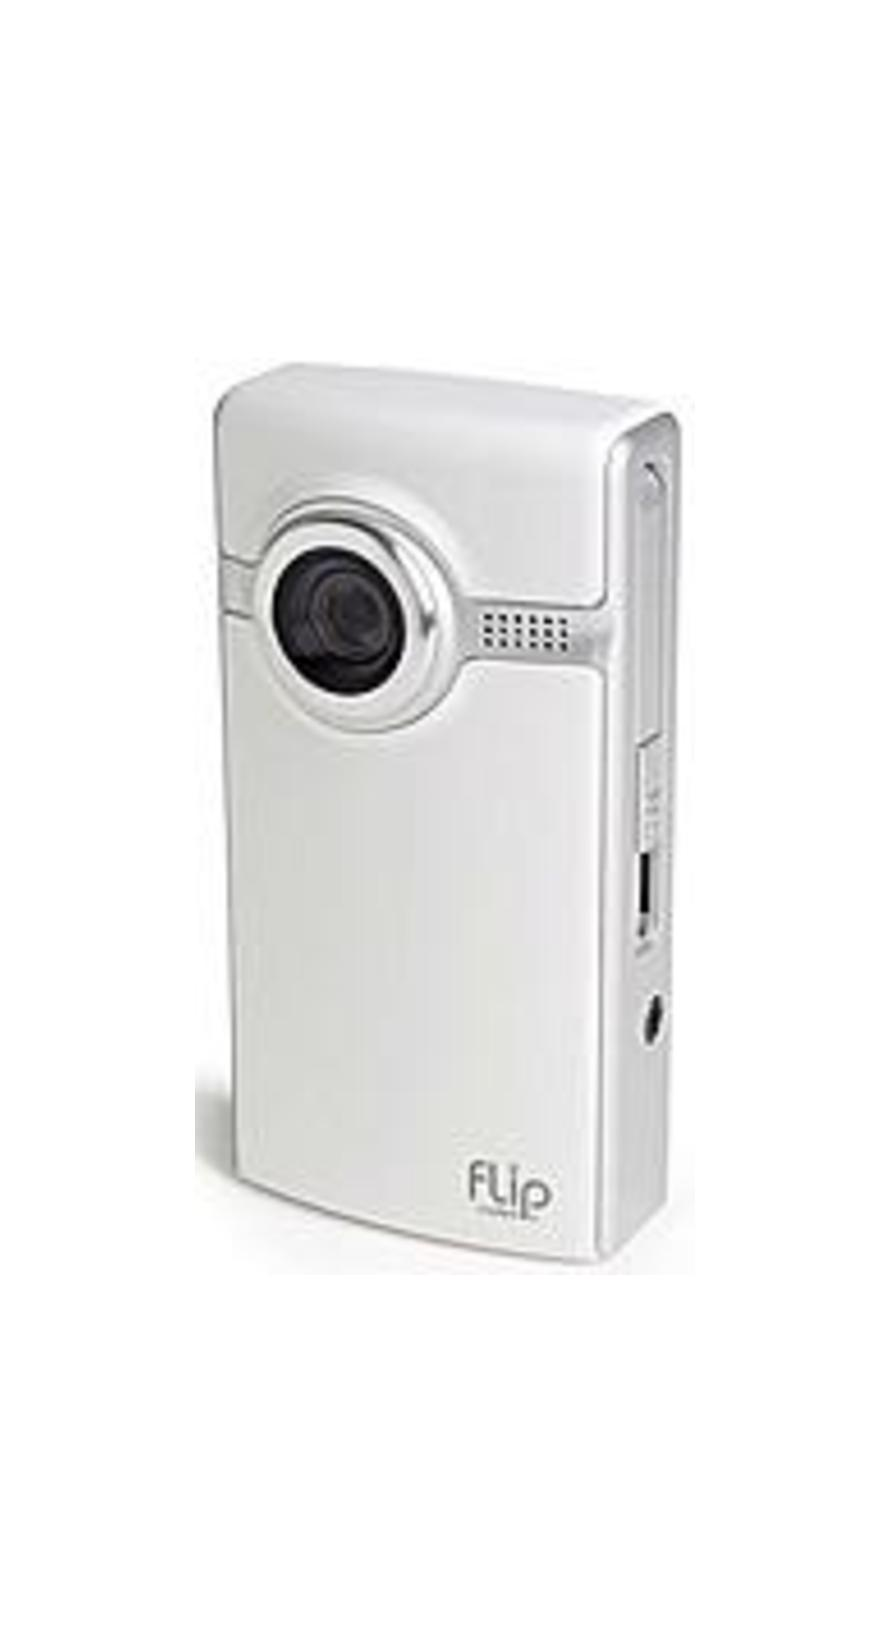 Pure Digital F260W Flip Video Ultra Series 60 Minutes 2 GB Digital Camcorder - White